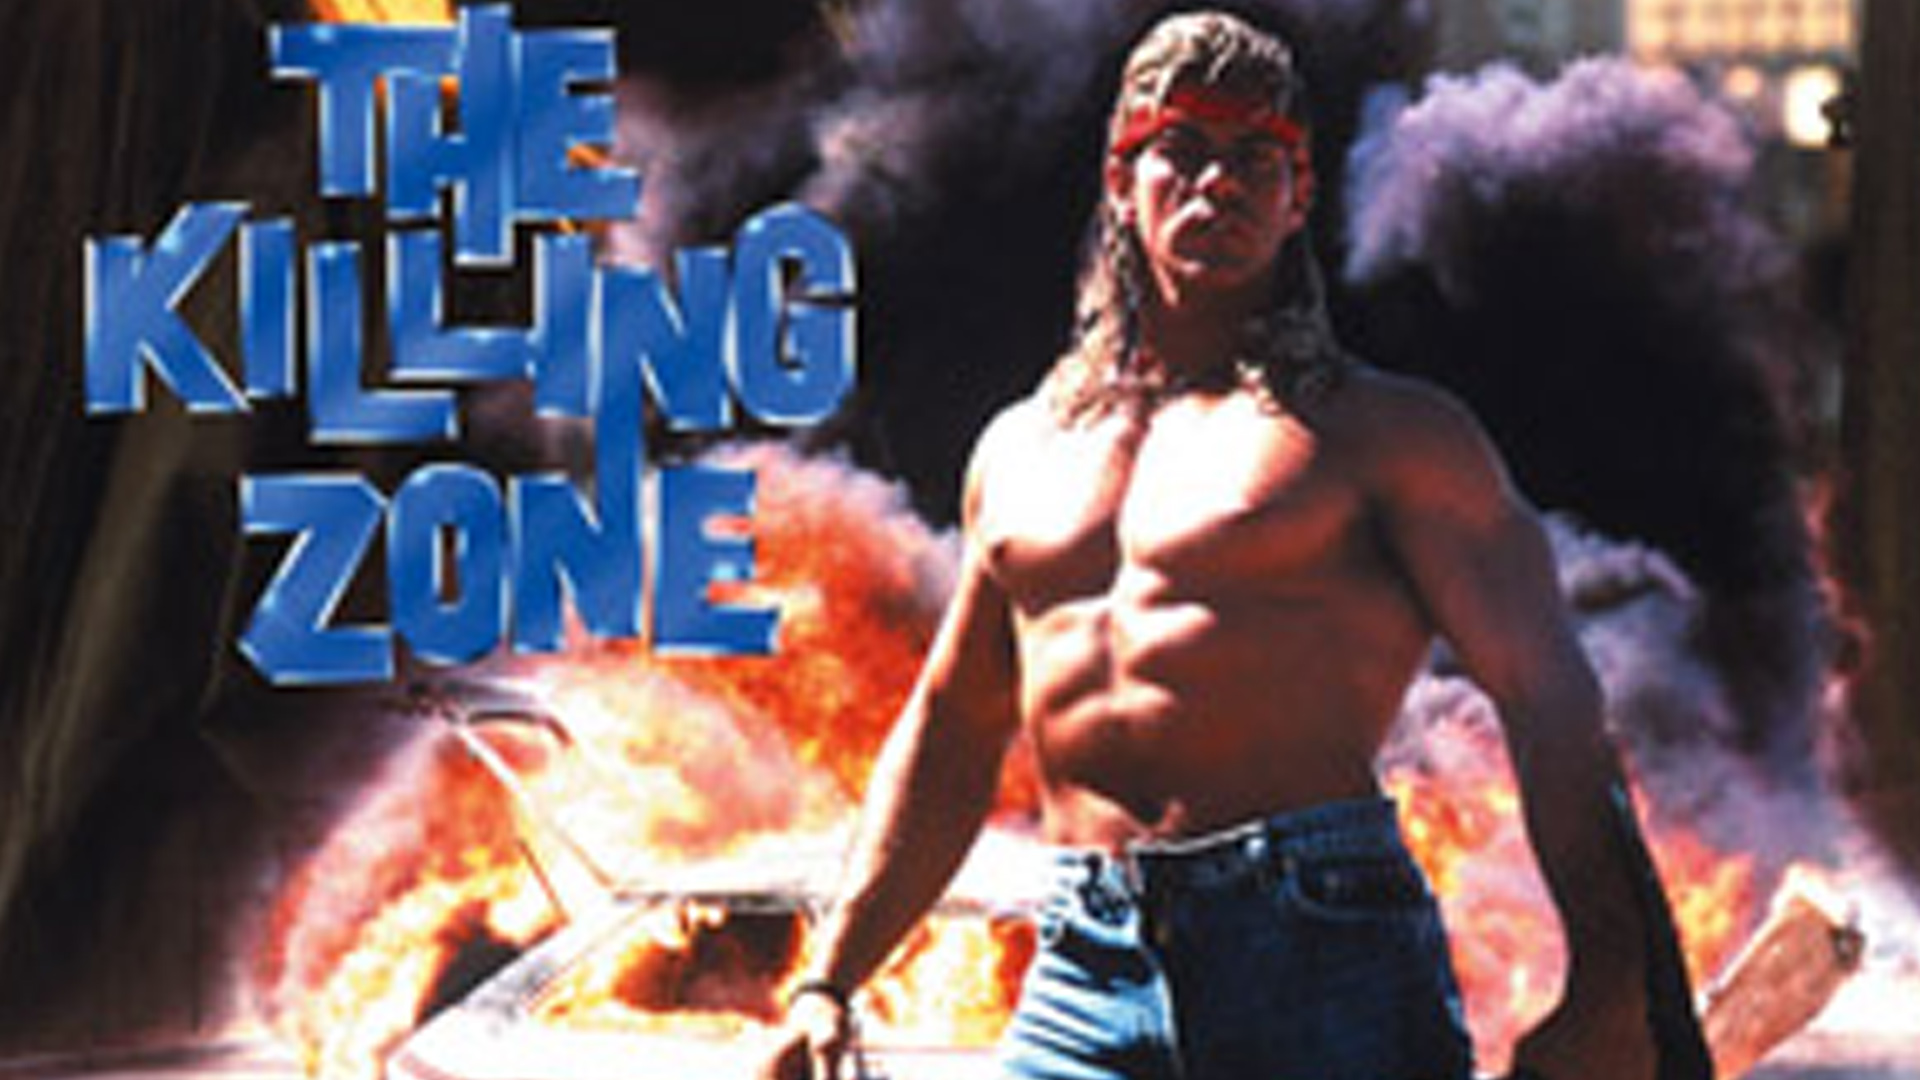 The Killing Zone on Amazon Prime Video UK